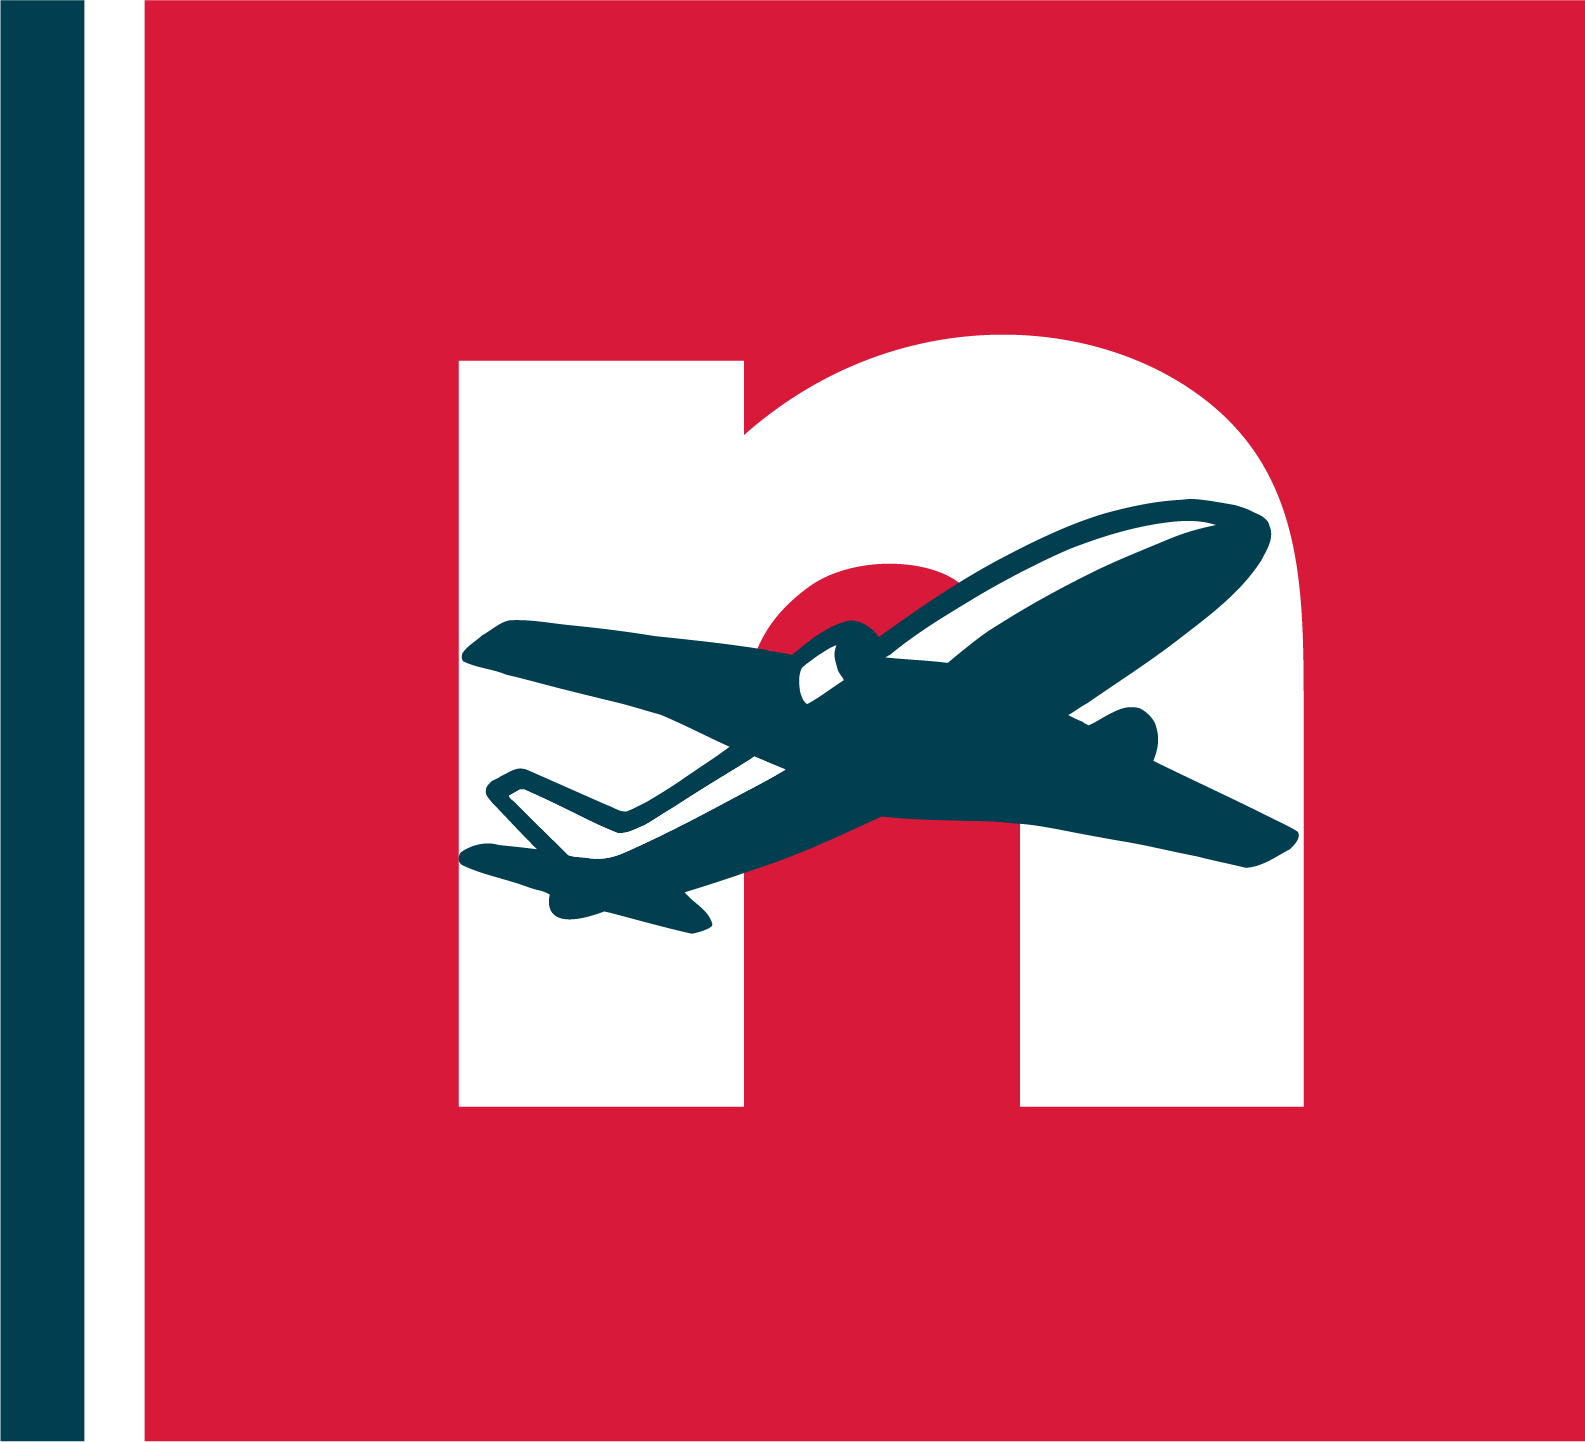 Norwegian Long Haul